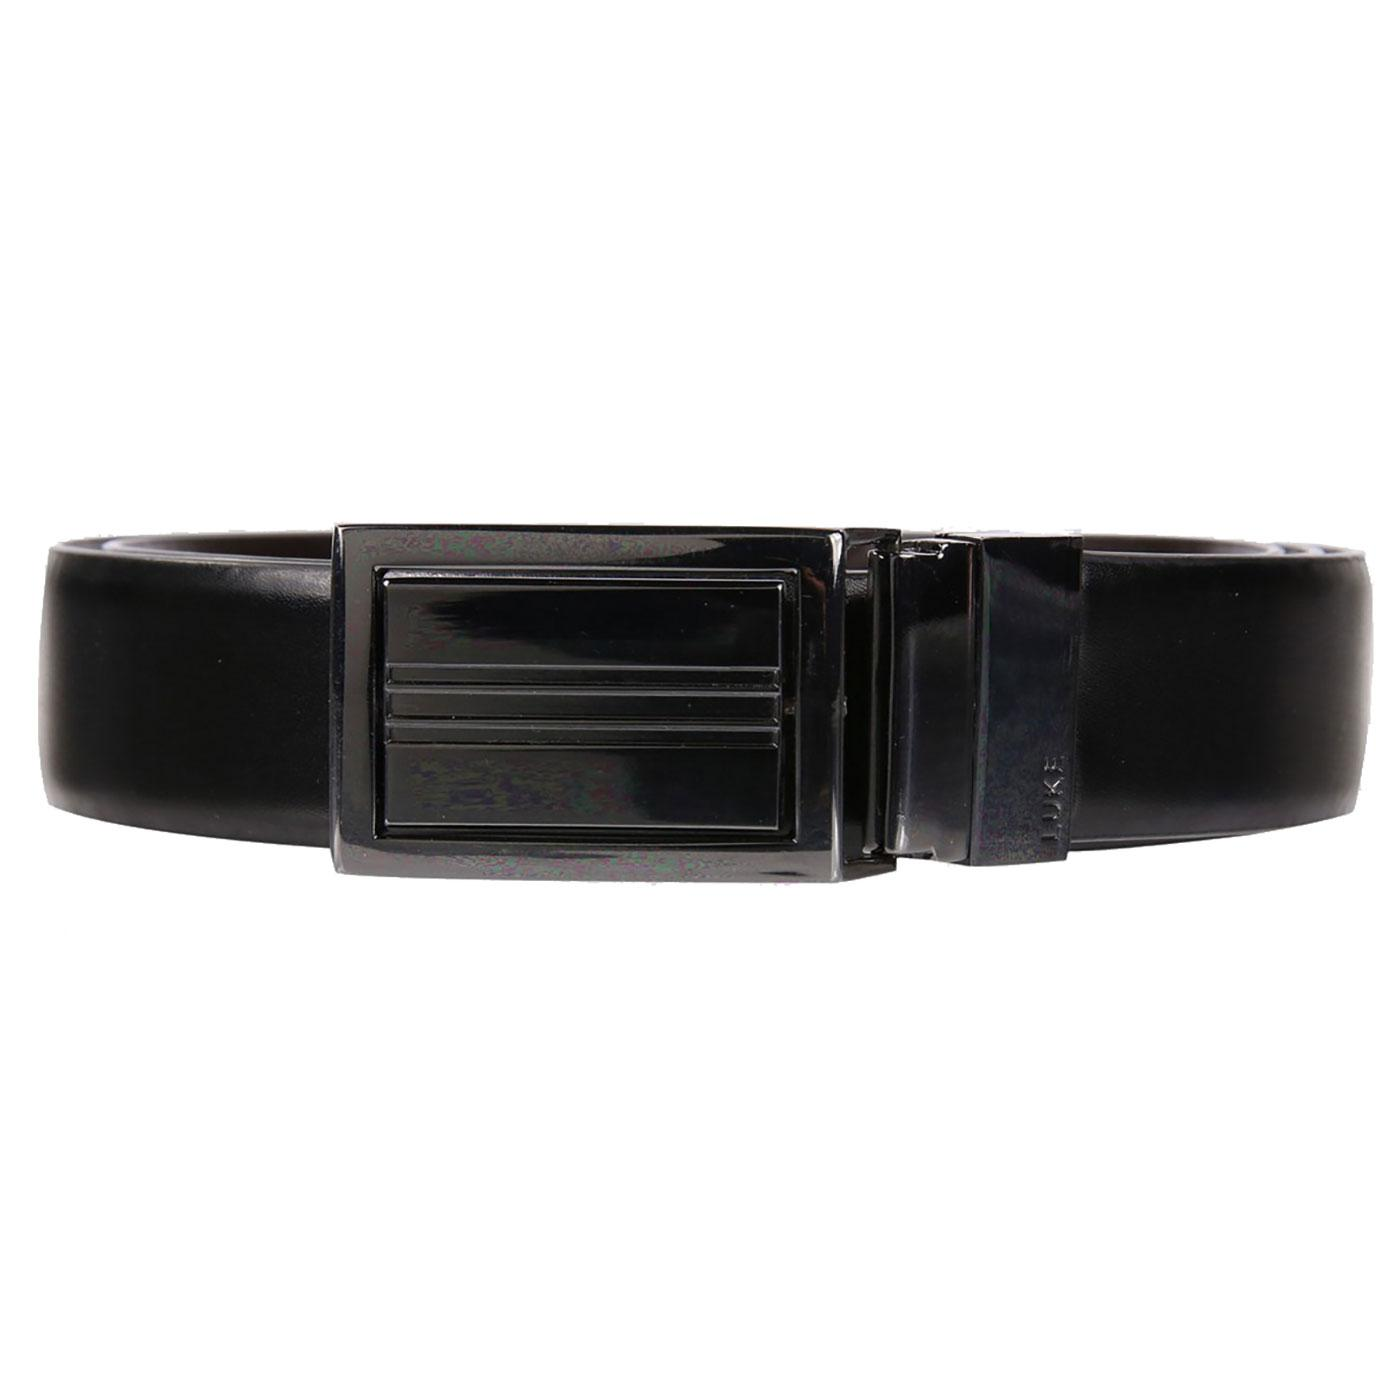 Jimmy's LUKE Retro Reversible Belt - Black/Brown